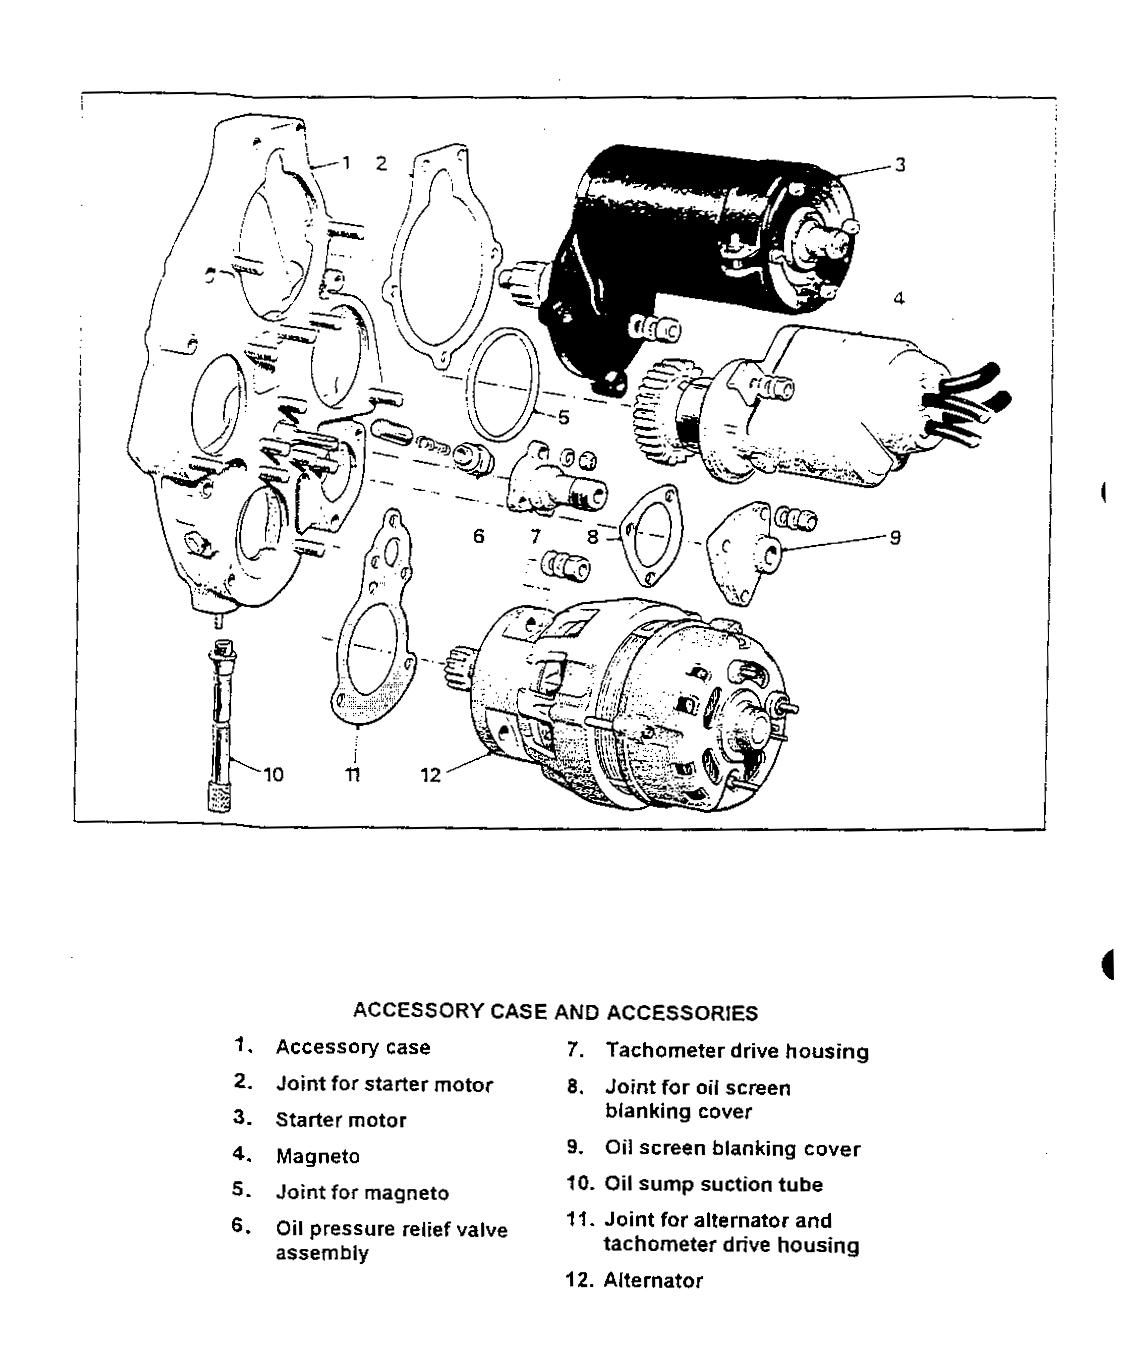 aircraft fuel filter types